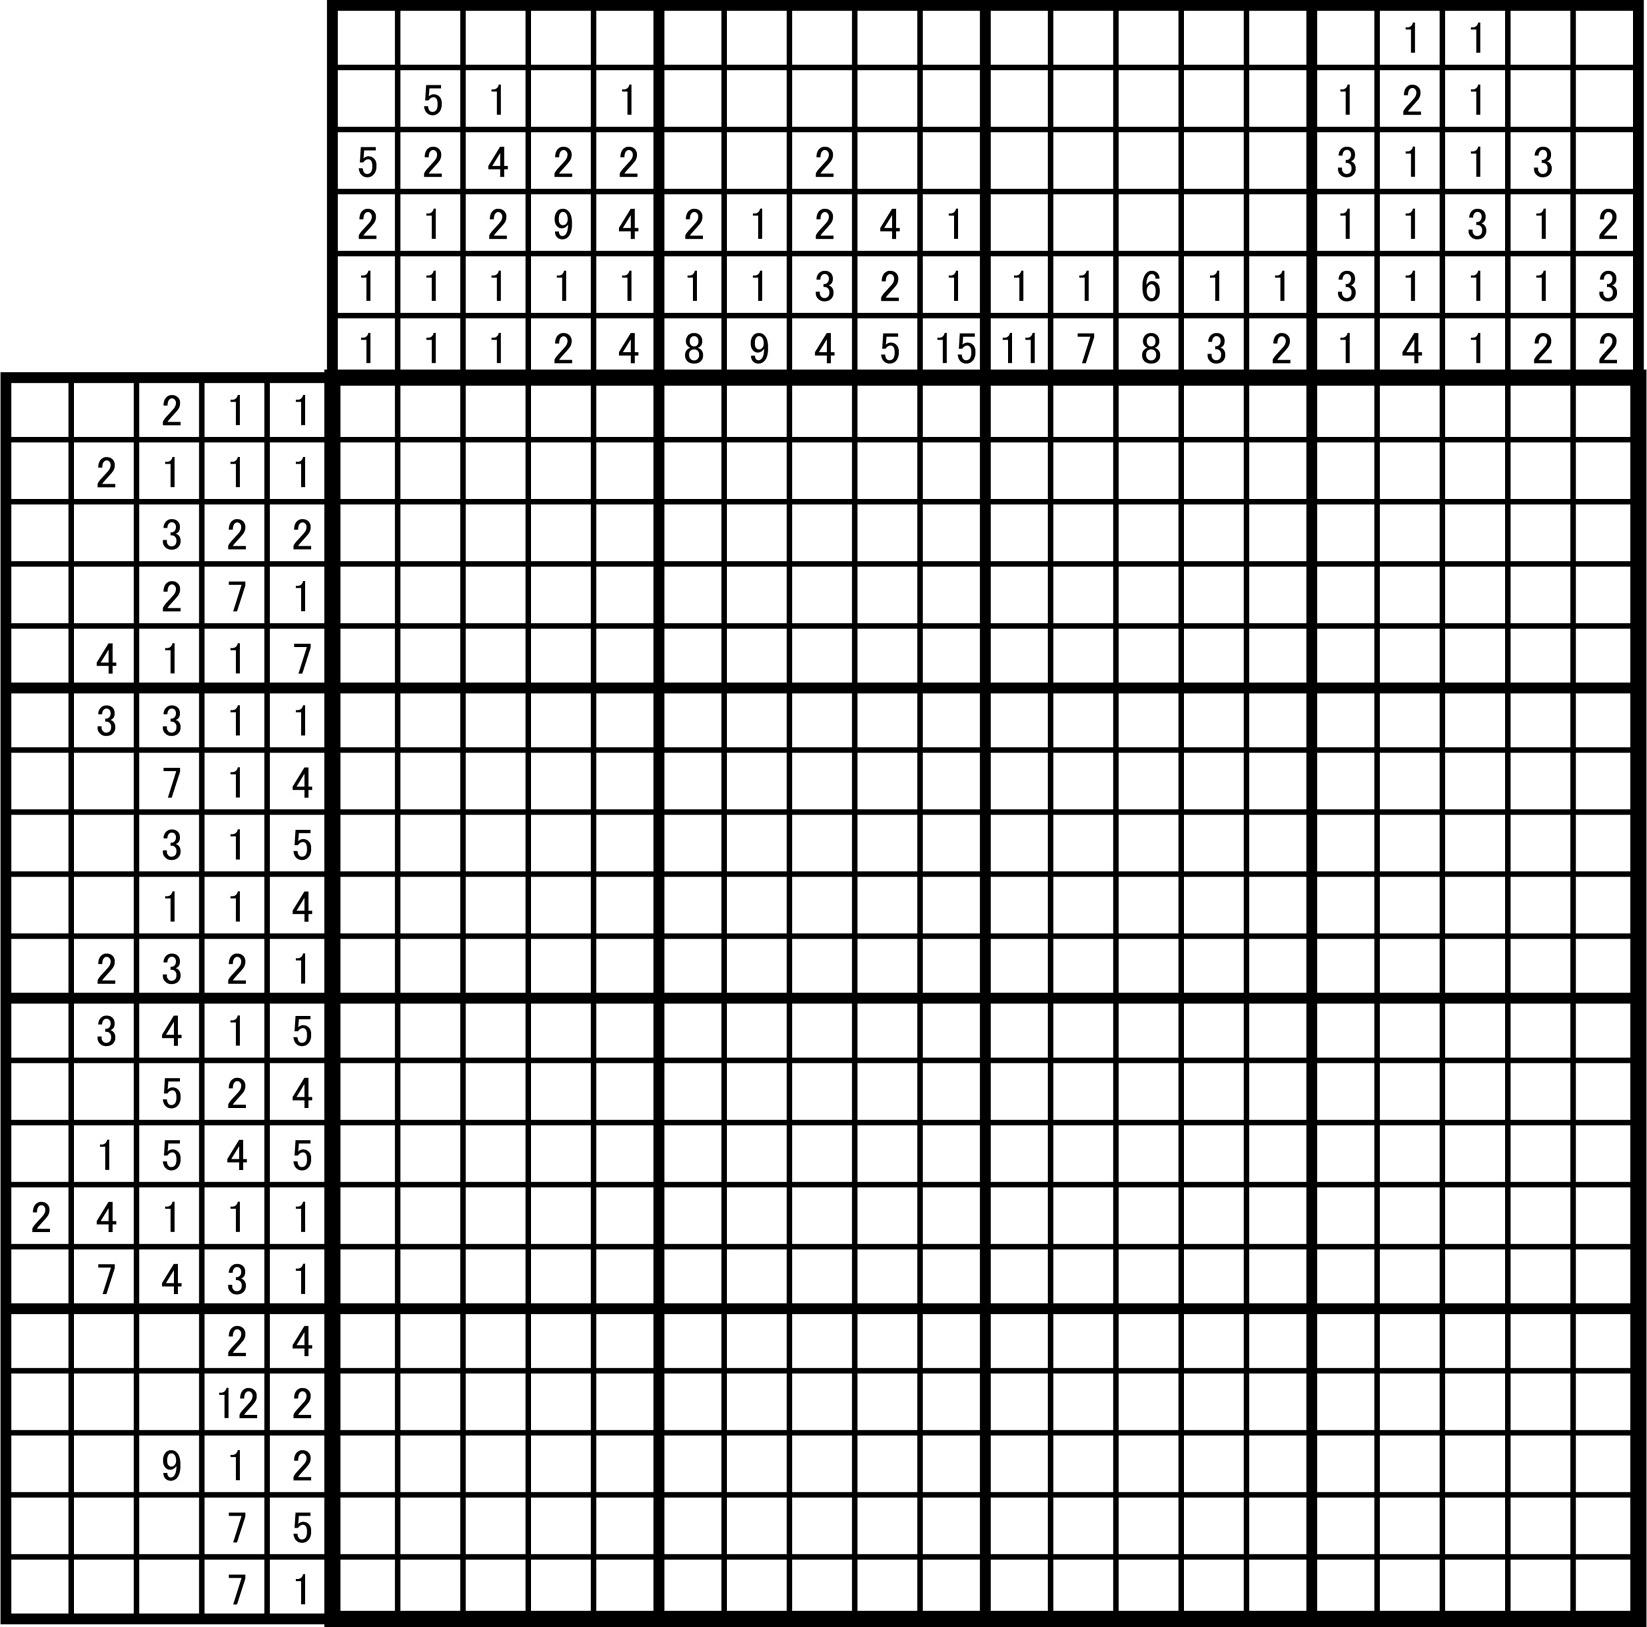 puzzle_dd_01.jpg